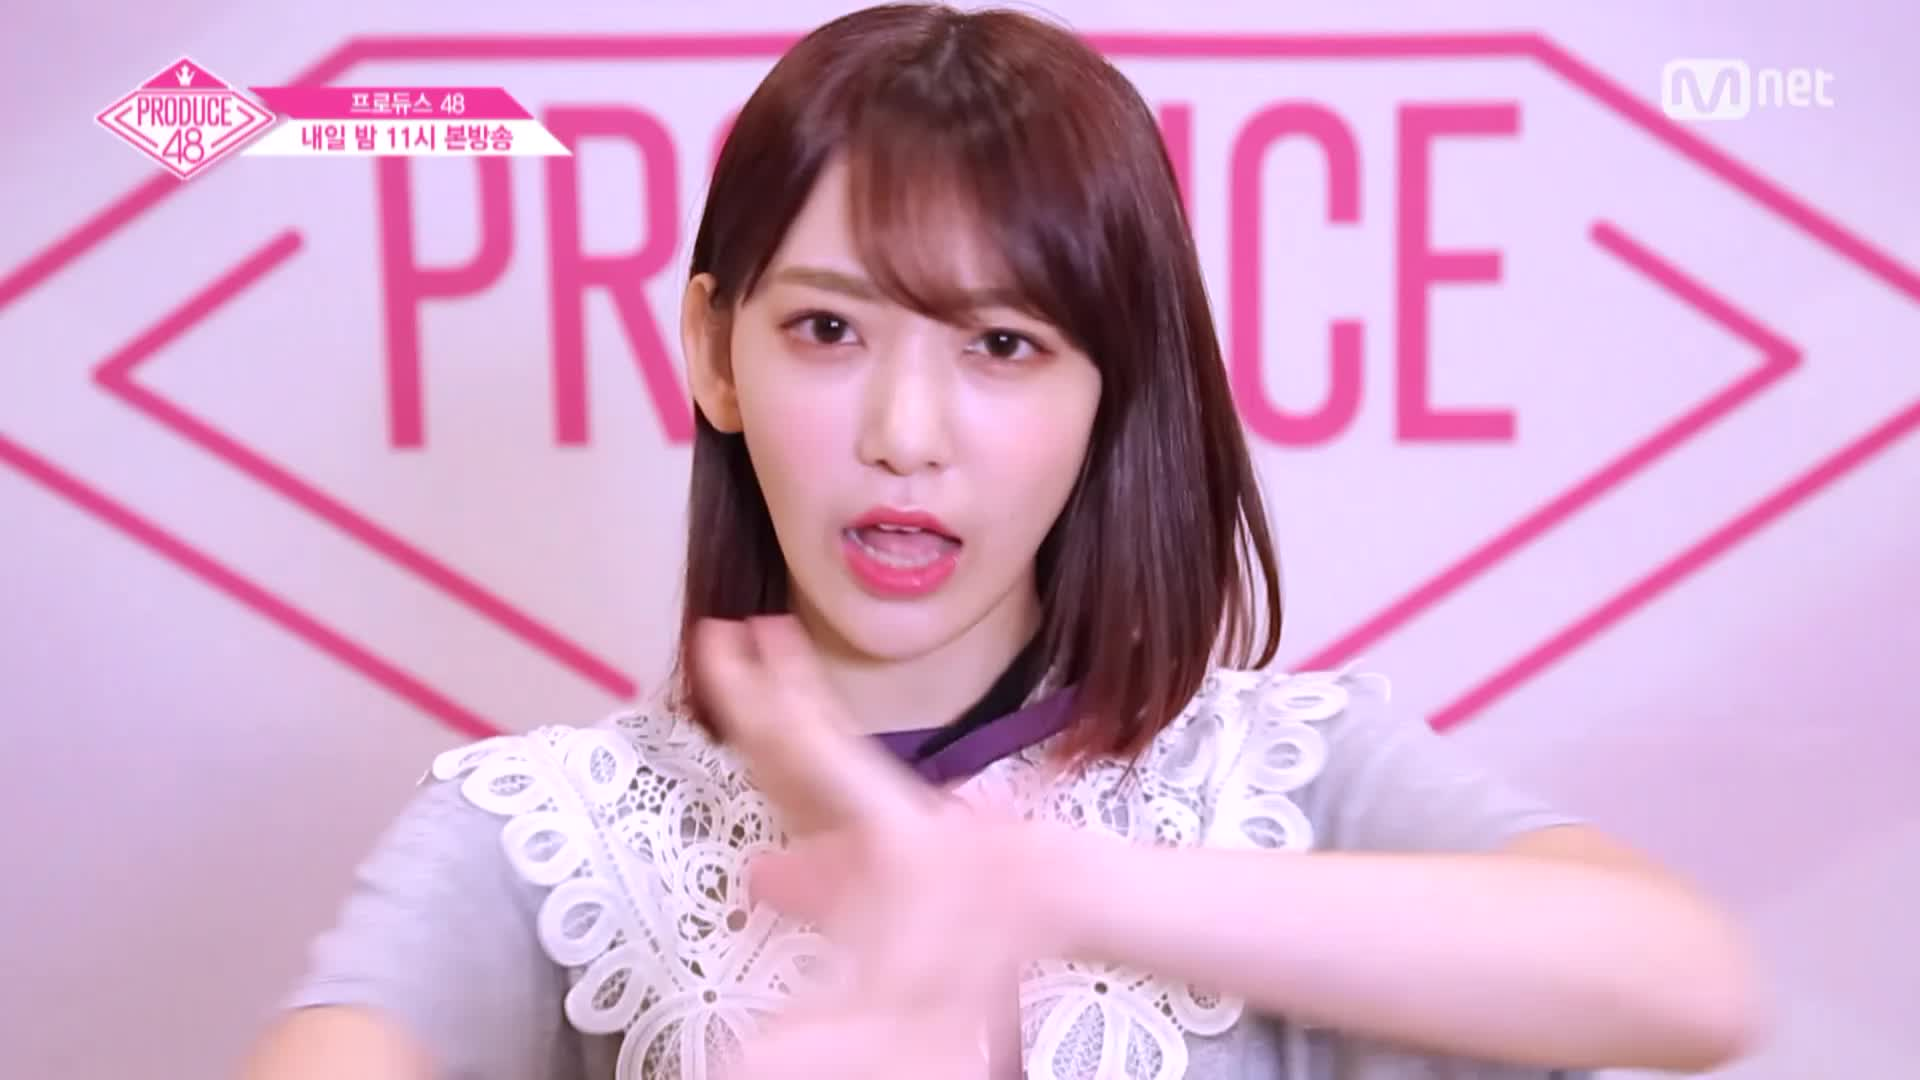 48tv Pick Me Close Up Ver Miyawaki Sakura 2 Gif By My Gif